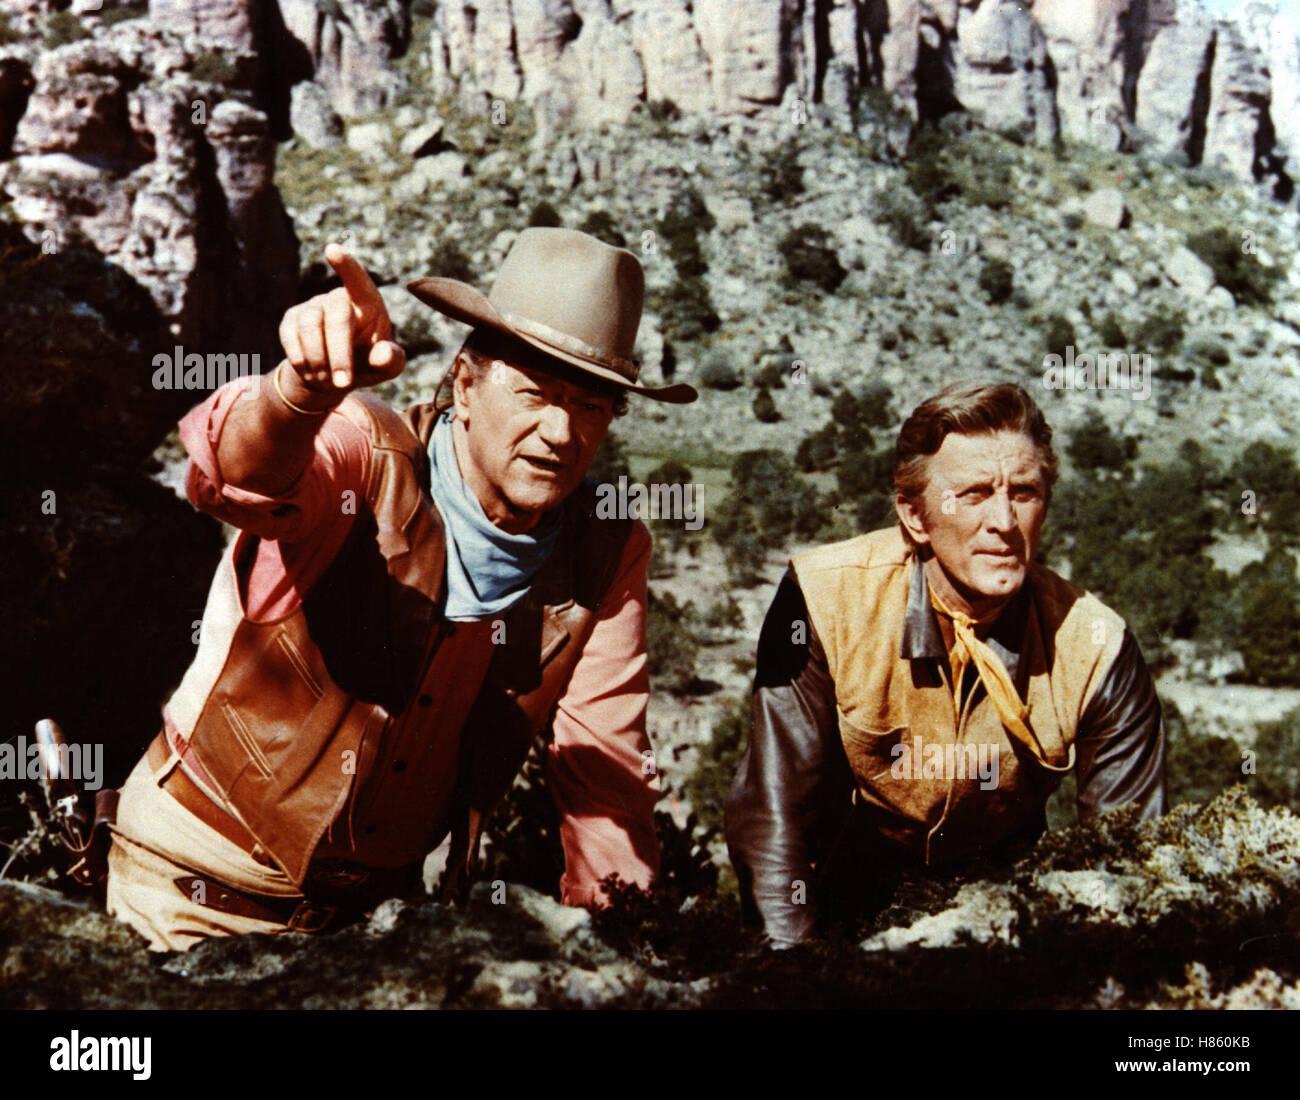 Die Gewaltigen, (THE WAR WAGON) USA 1966, Regie: Burt Kennedy, JOHN WAYNE + KIRK DOUGLAS - Stock Image